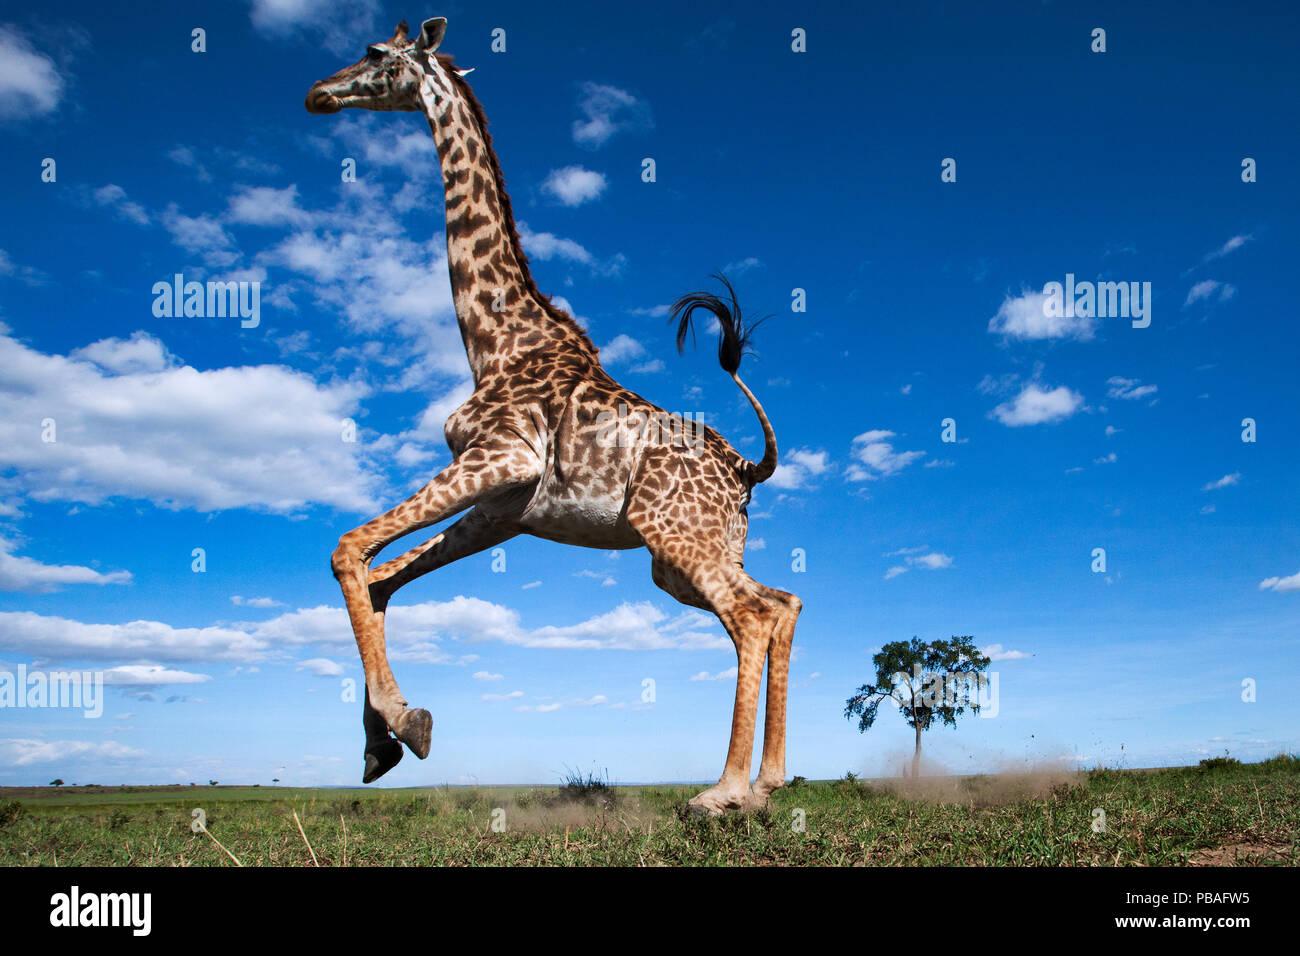 Maasai giraffe (Giraffa camelopardalis tippelskirchi) running away startled - remote camera perspective . Maasai Mara National Reserve, Kenya. - Stock Image